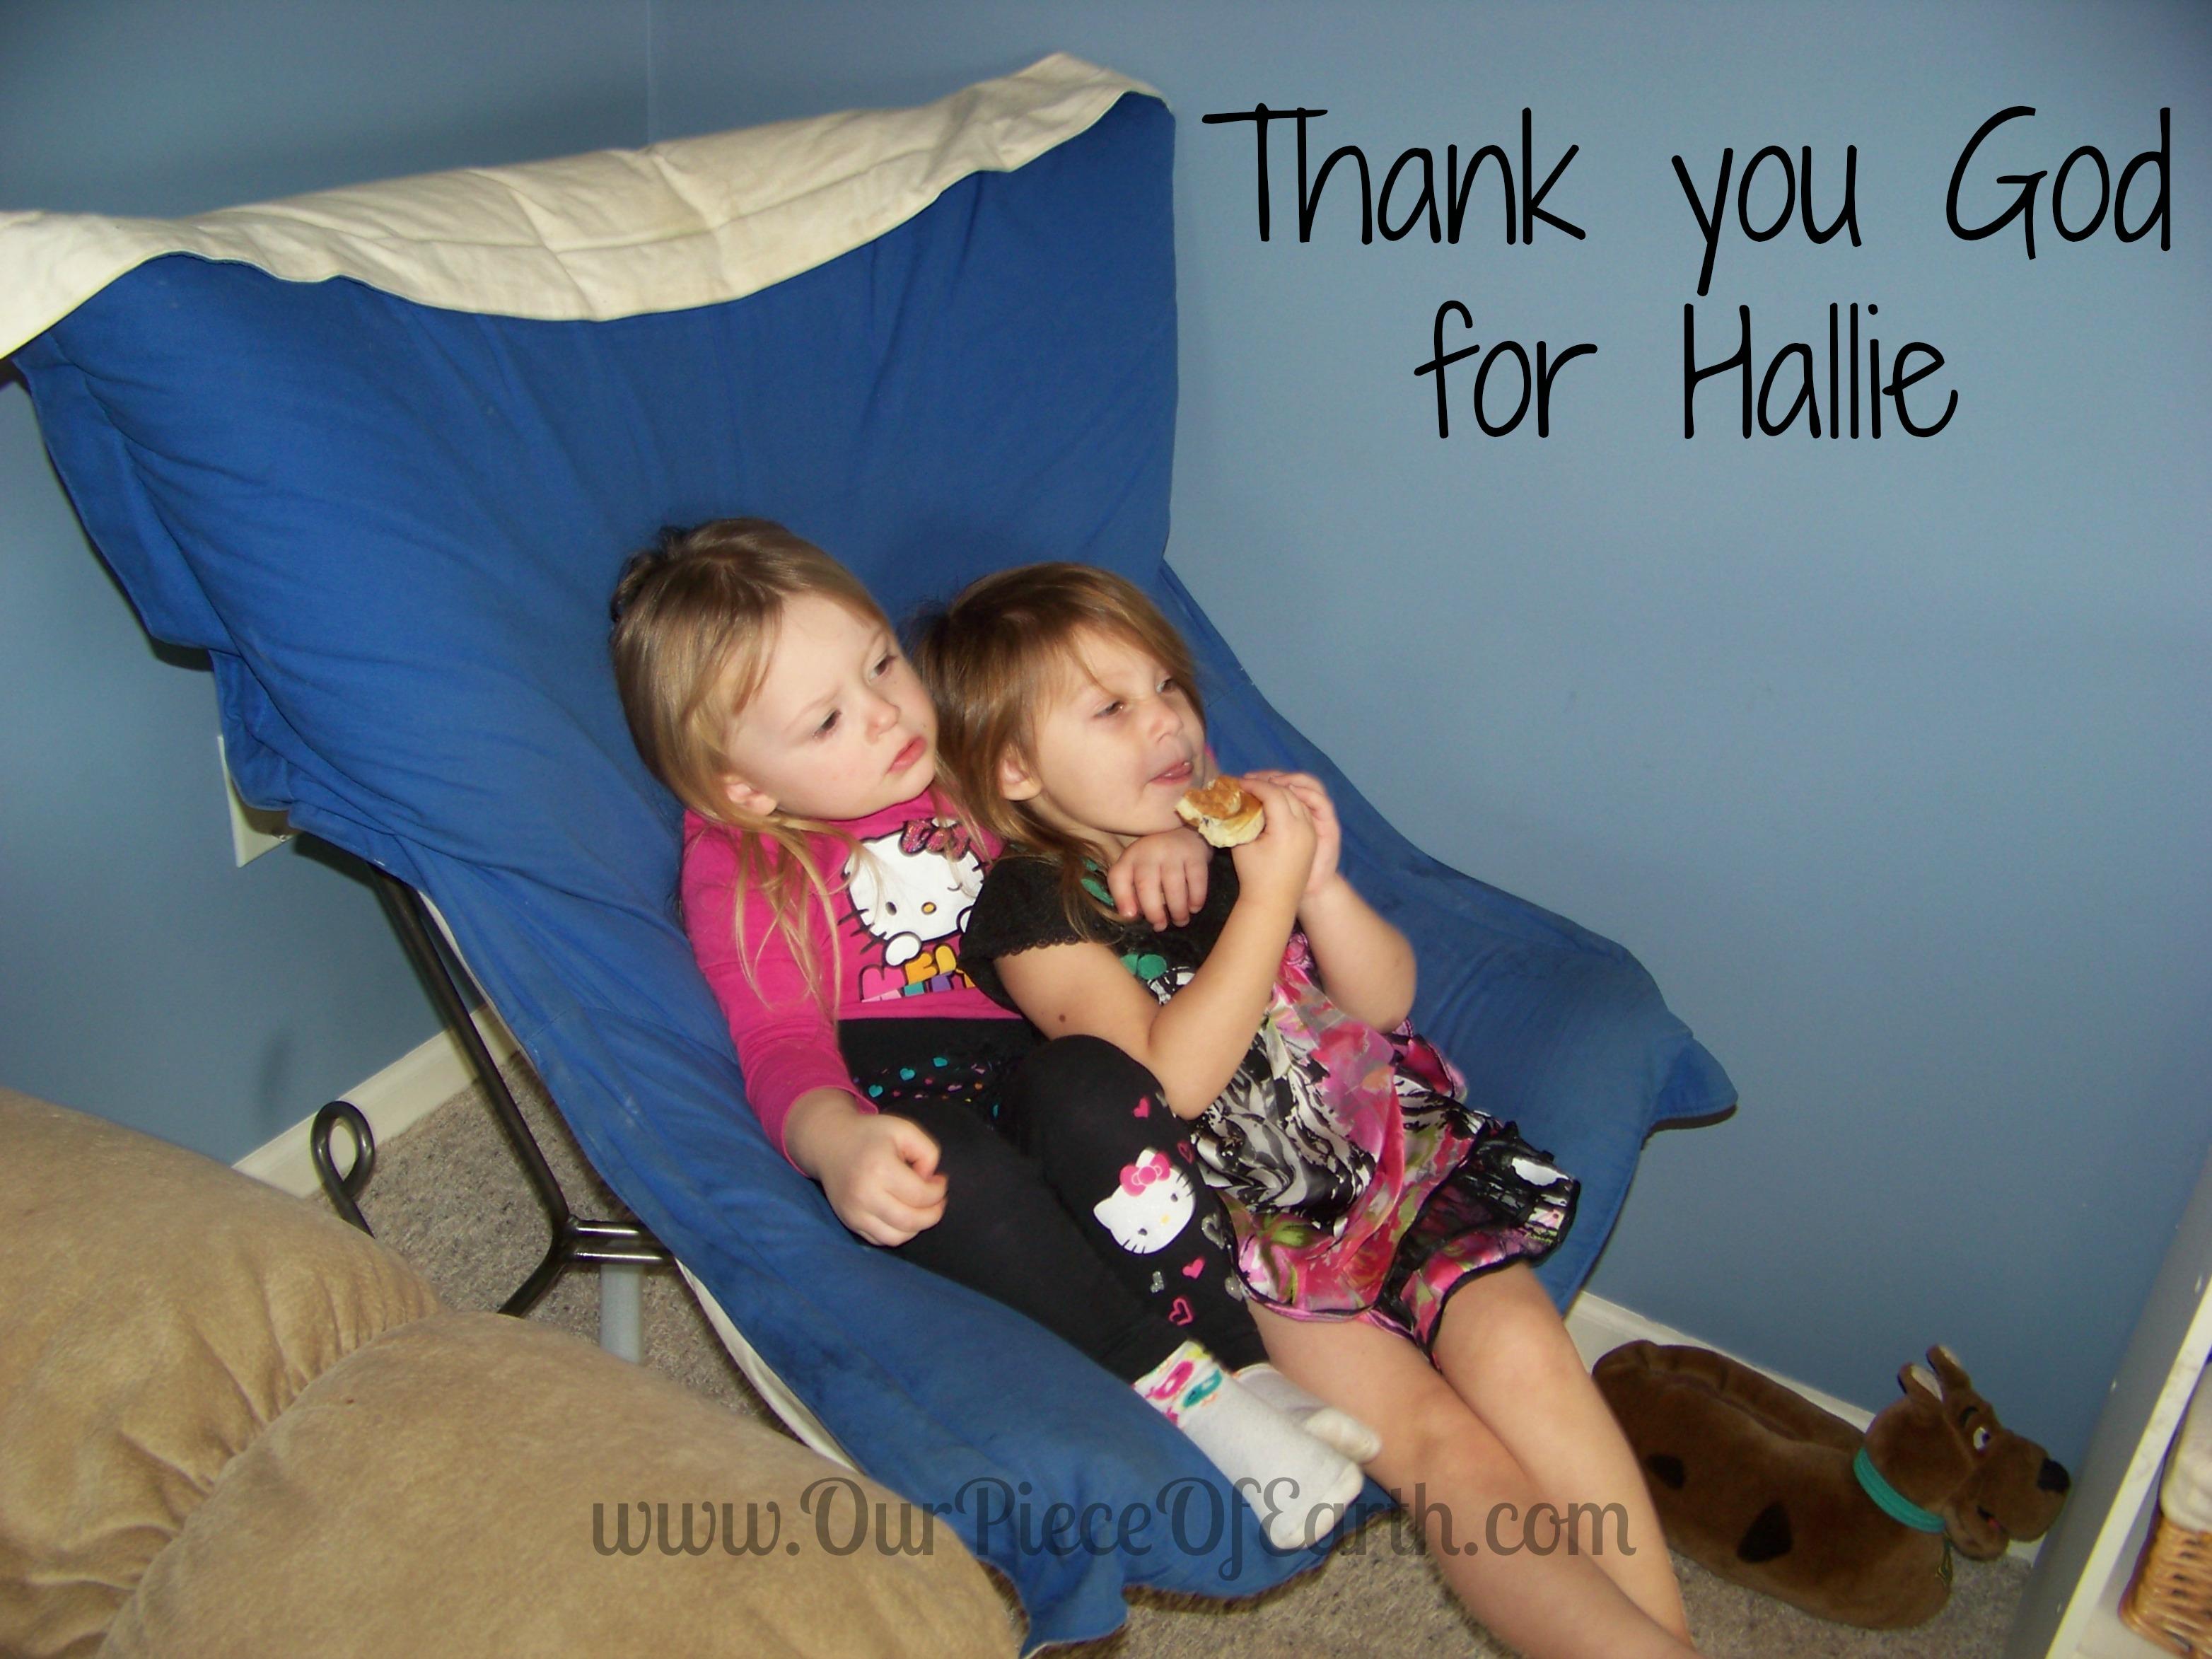 Thank you God for Hallie